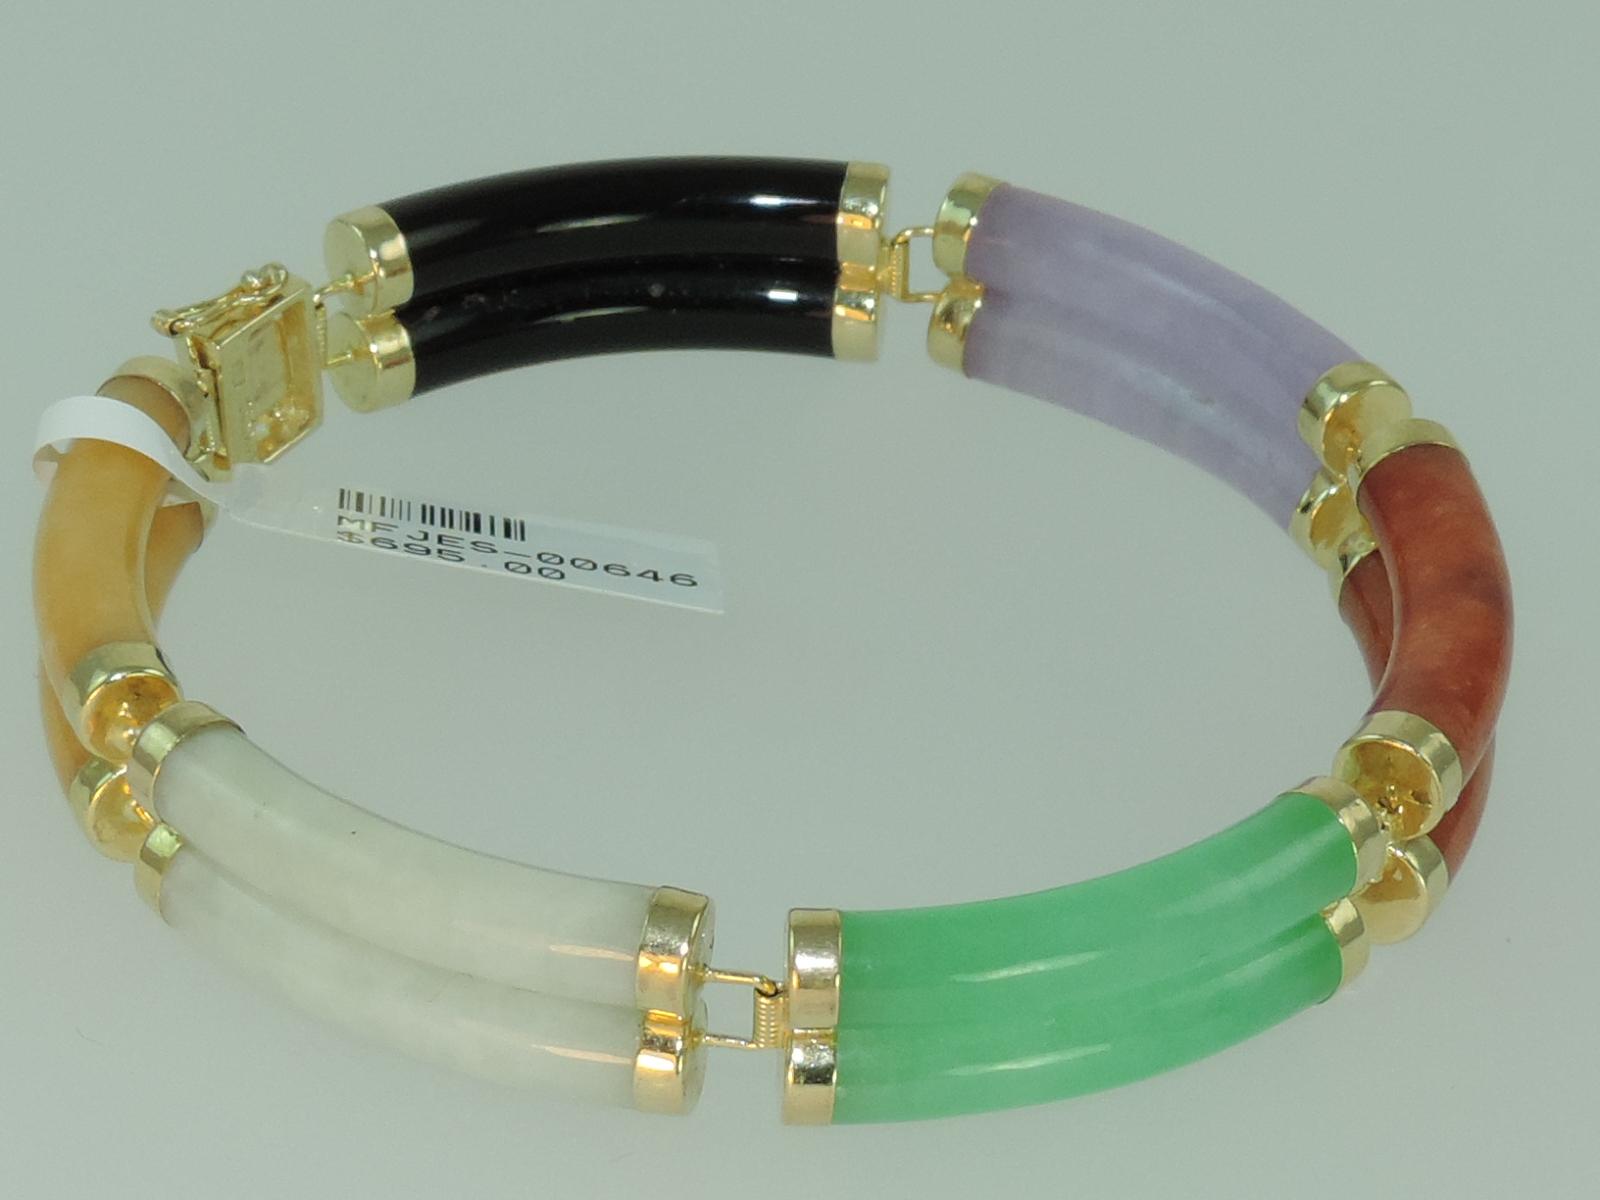 Mulit colored Jadite Jade Bracelet 14k Yellow Gold, Issaquah